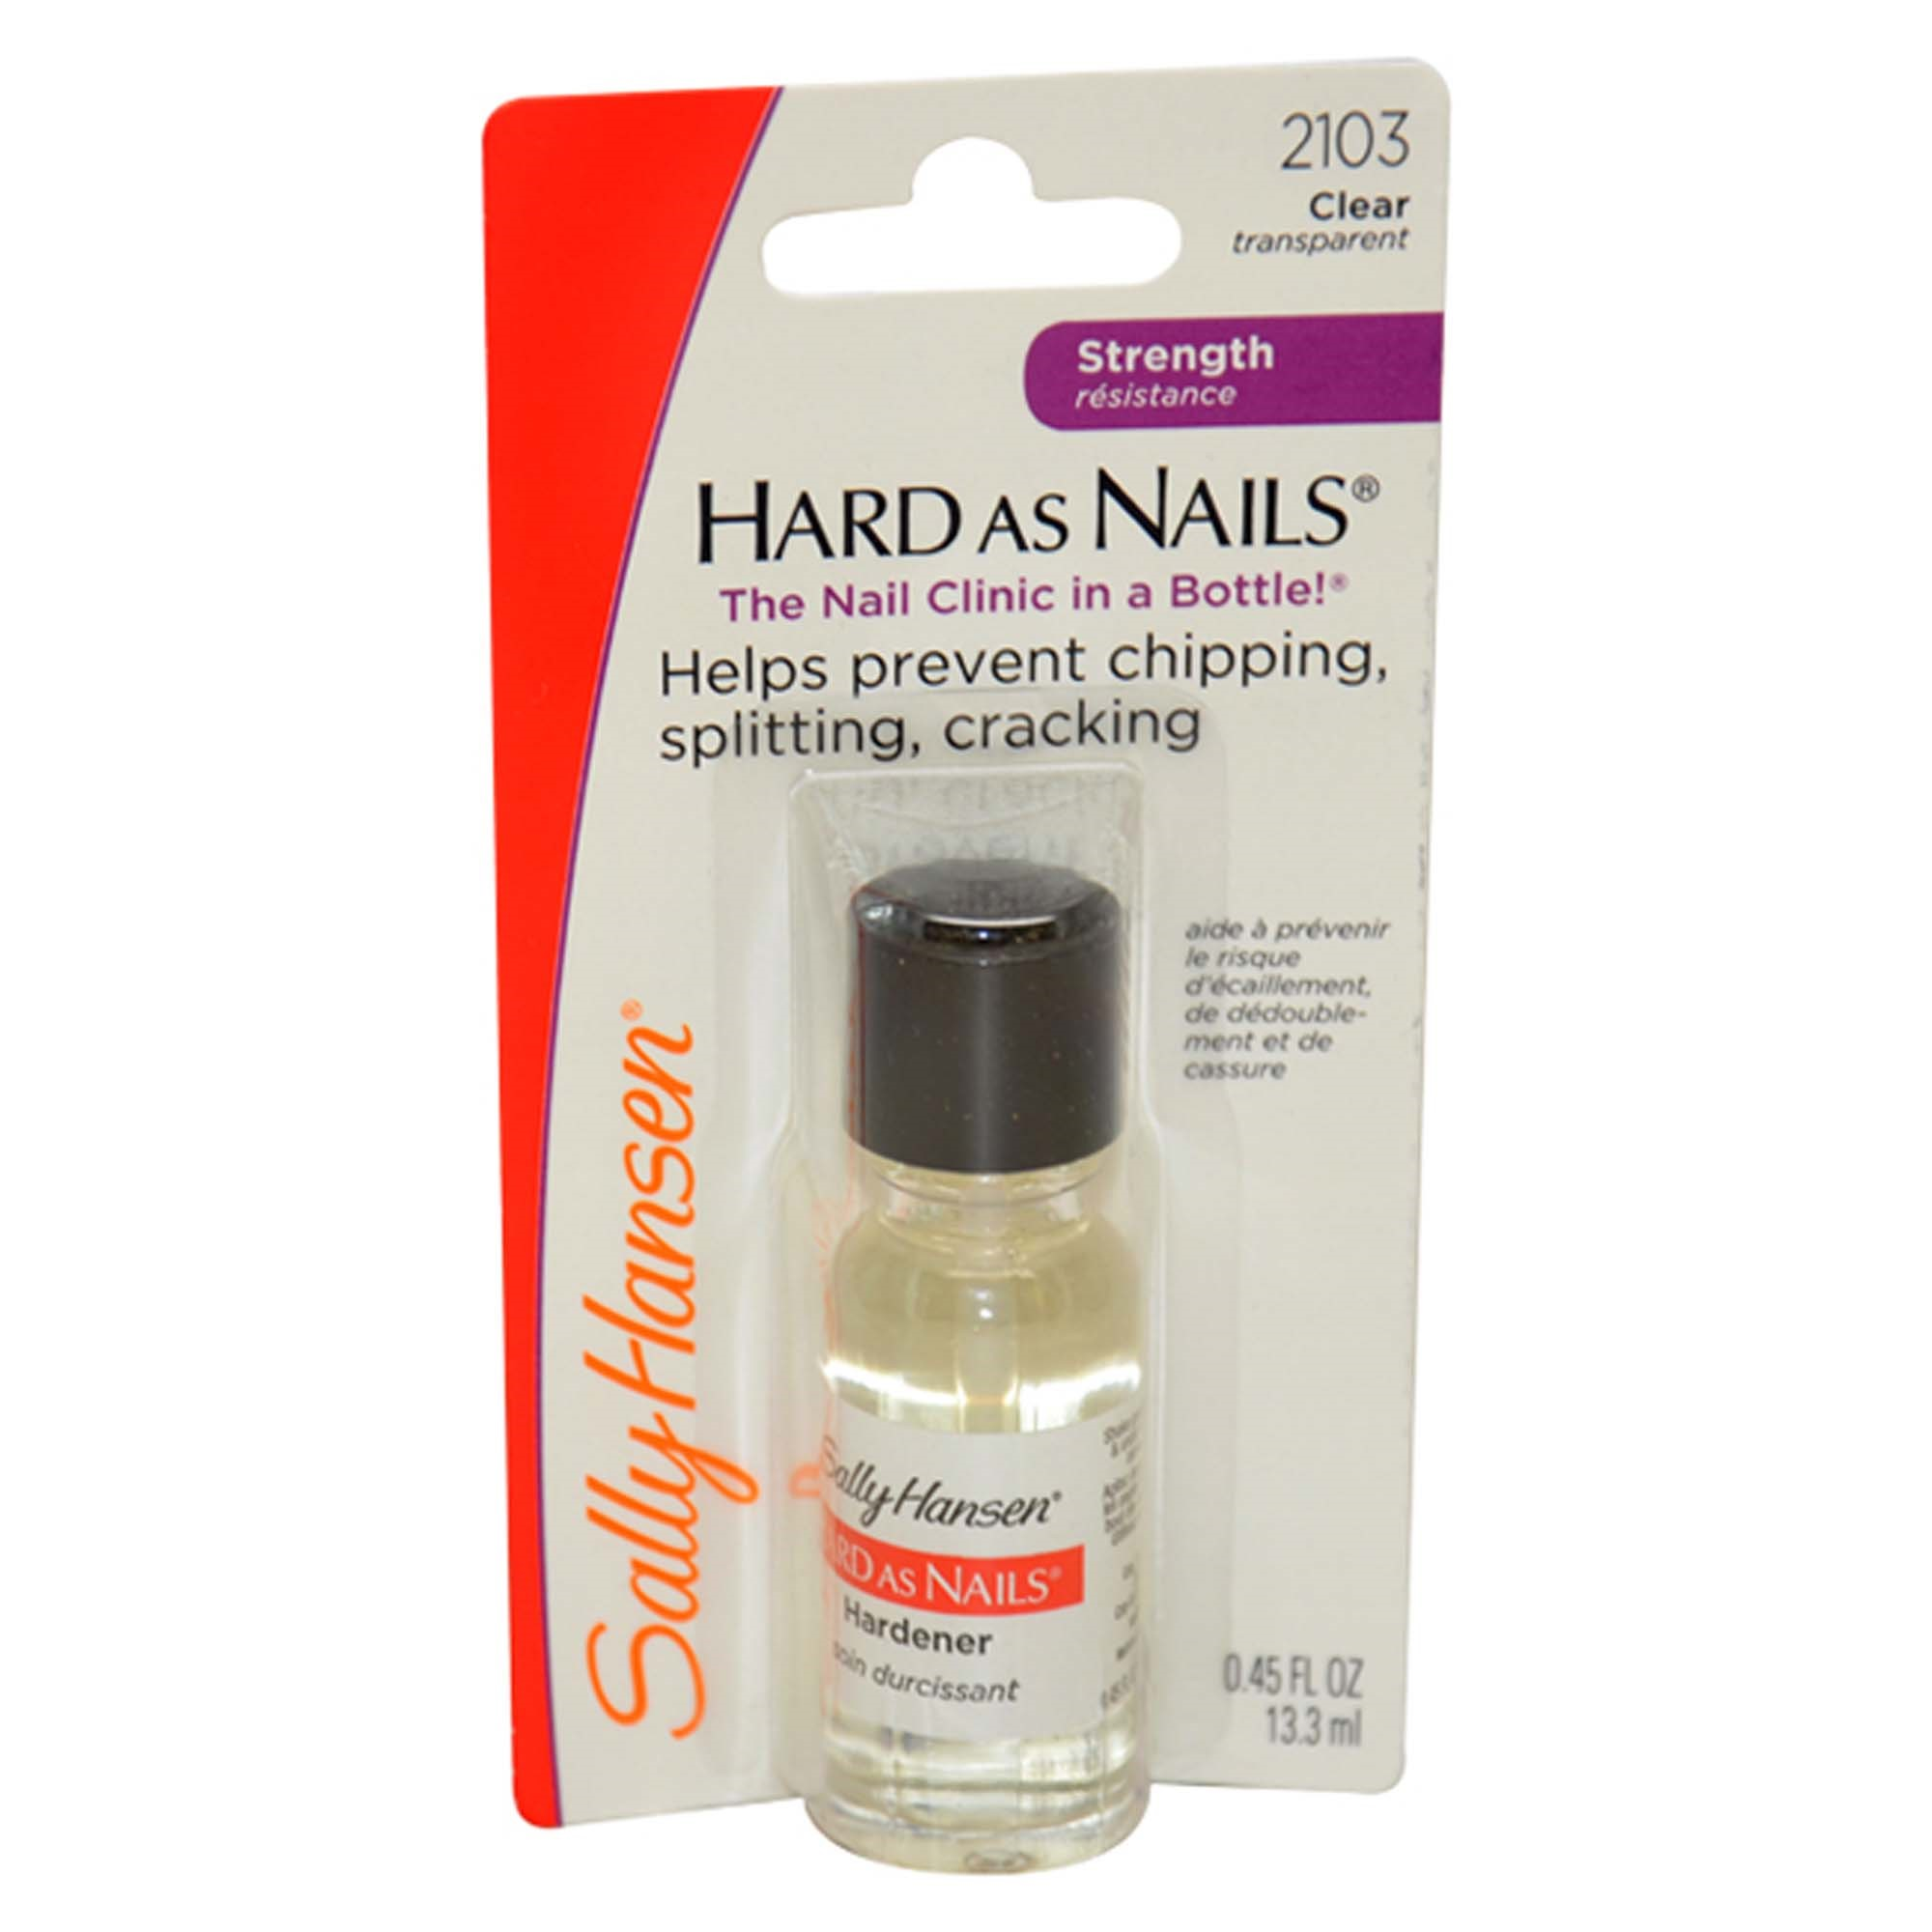 Sally Hansen Hard As Nails Regular 2103 Clear Transpa 0 45 Oz